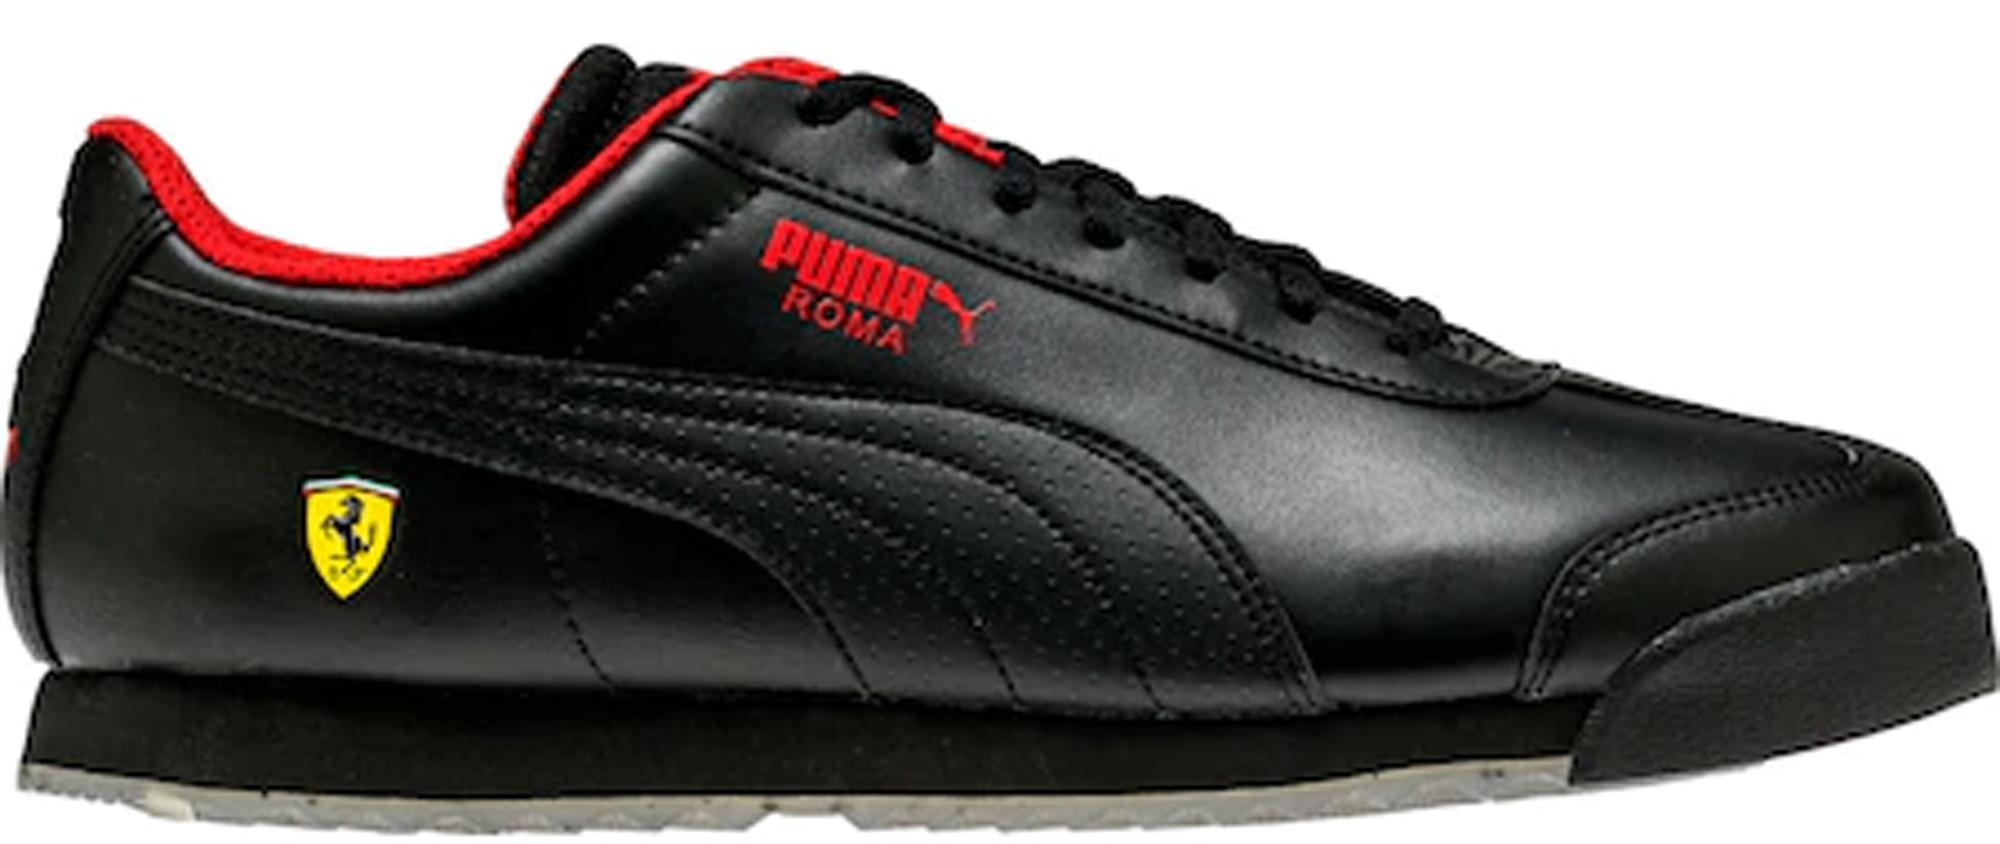 Puma SF Roma Ferrari Black - 306011-02